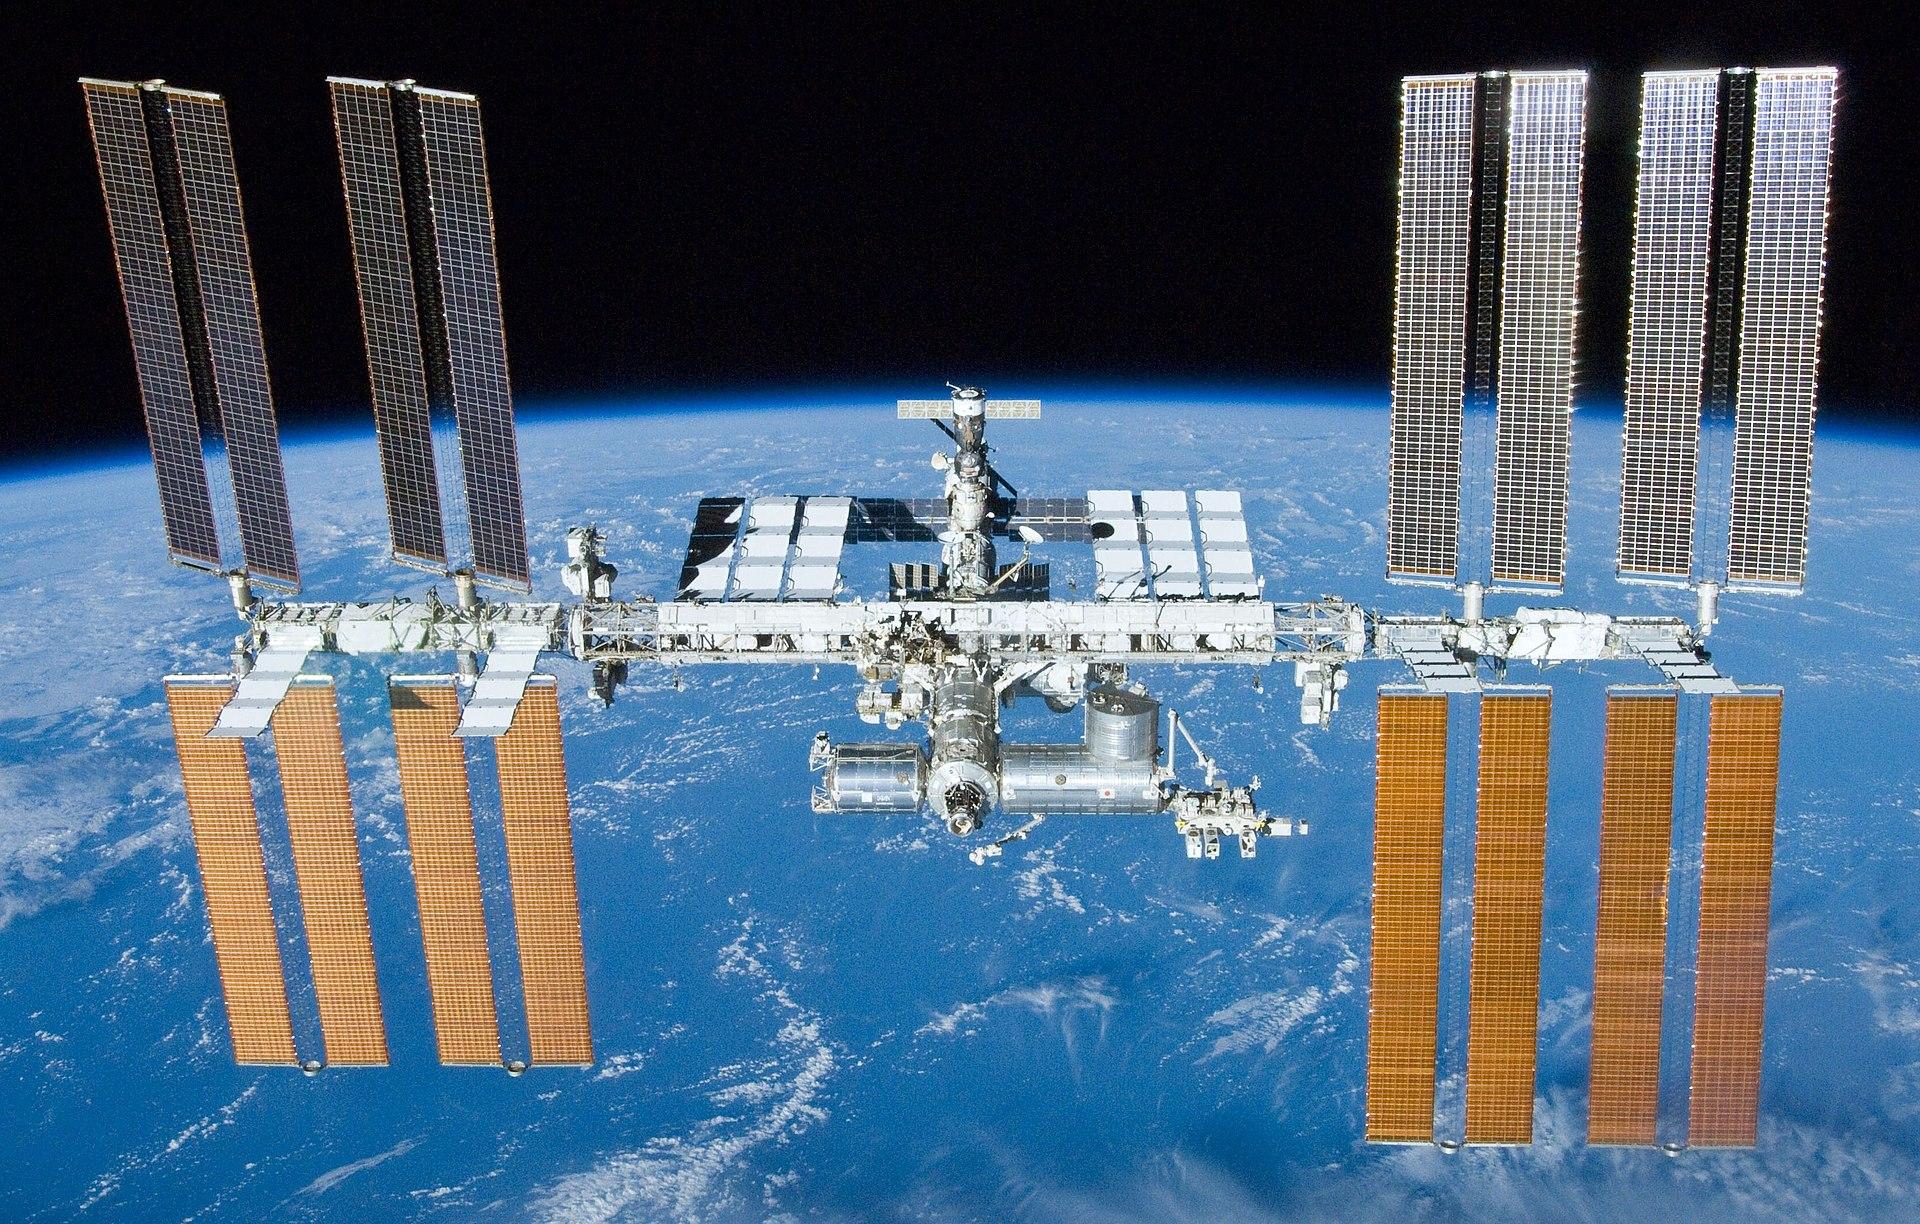 МКС (c) https://en.wikipedia.org/wiki/International_Space_Station